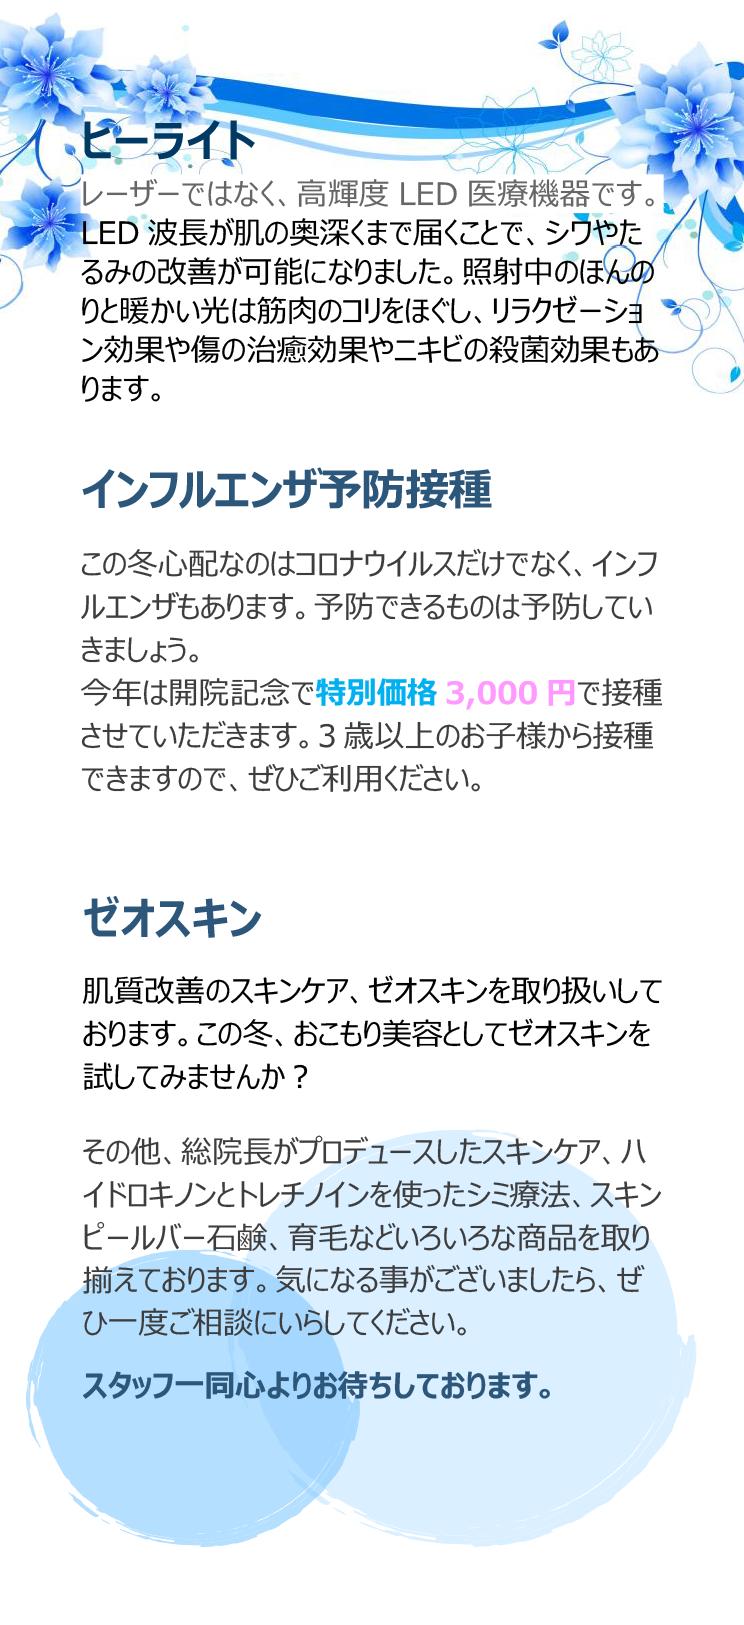 news-vol1-4